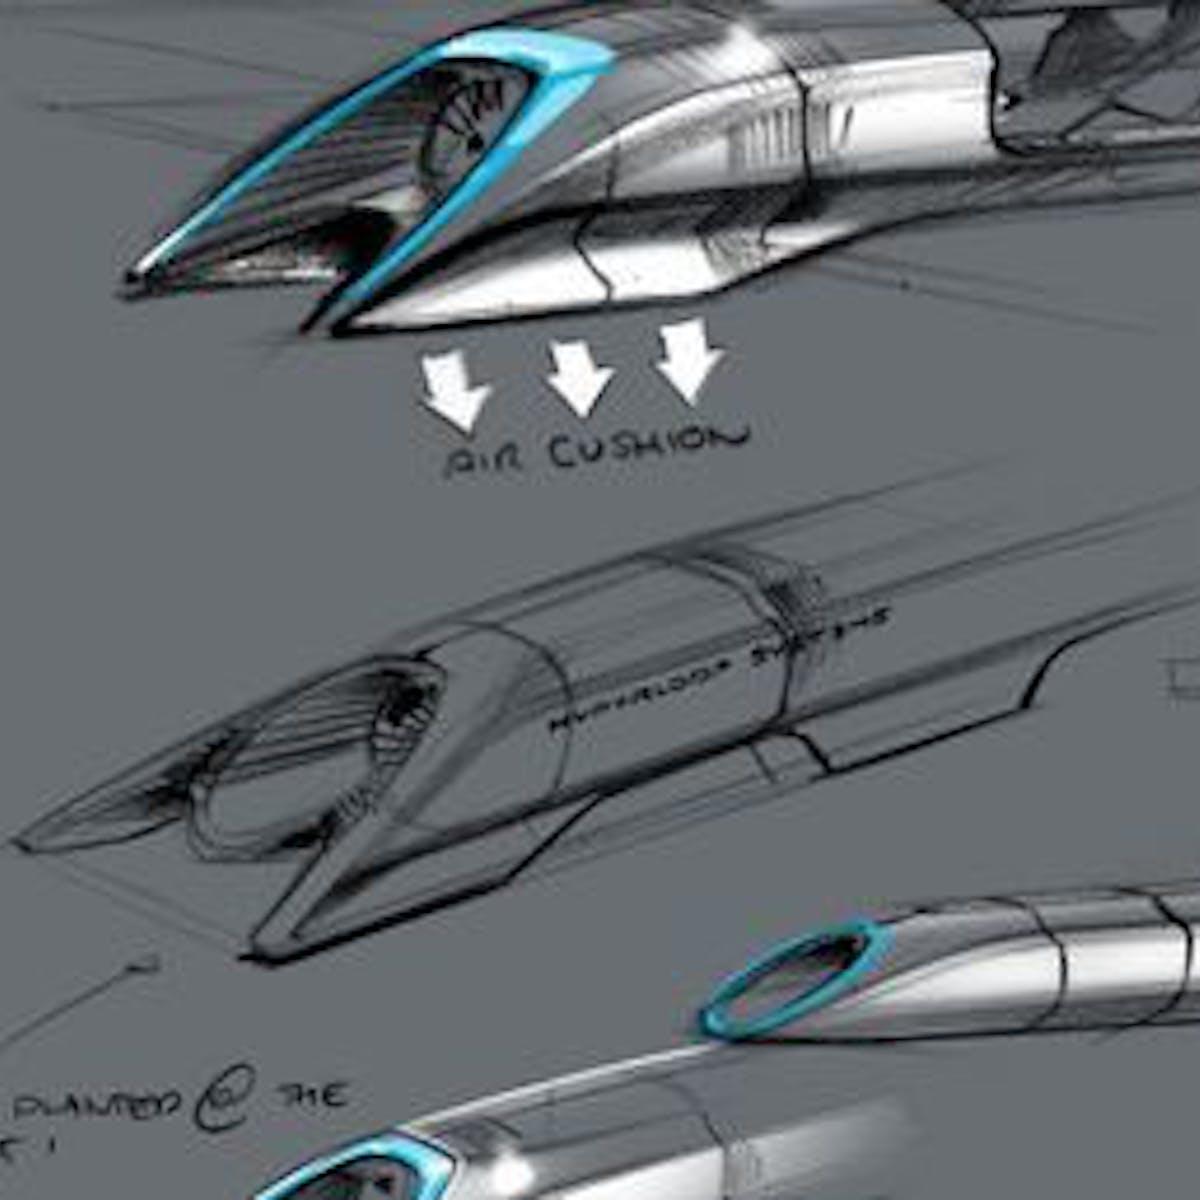 Hyperloop Reveals It Has Received 125 Preliminary Designs